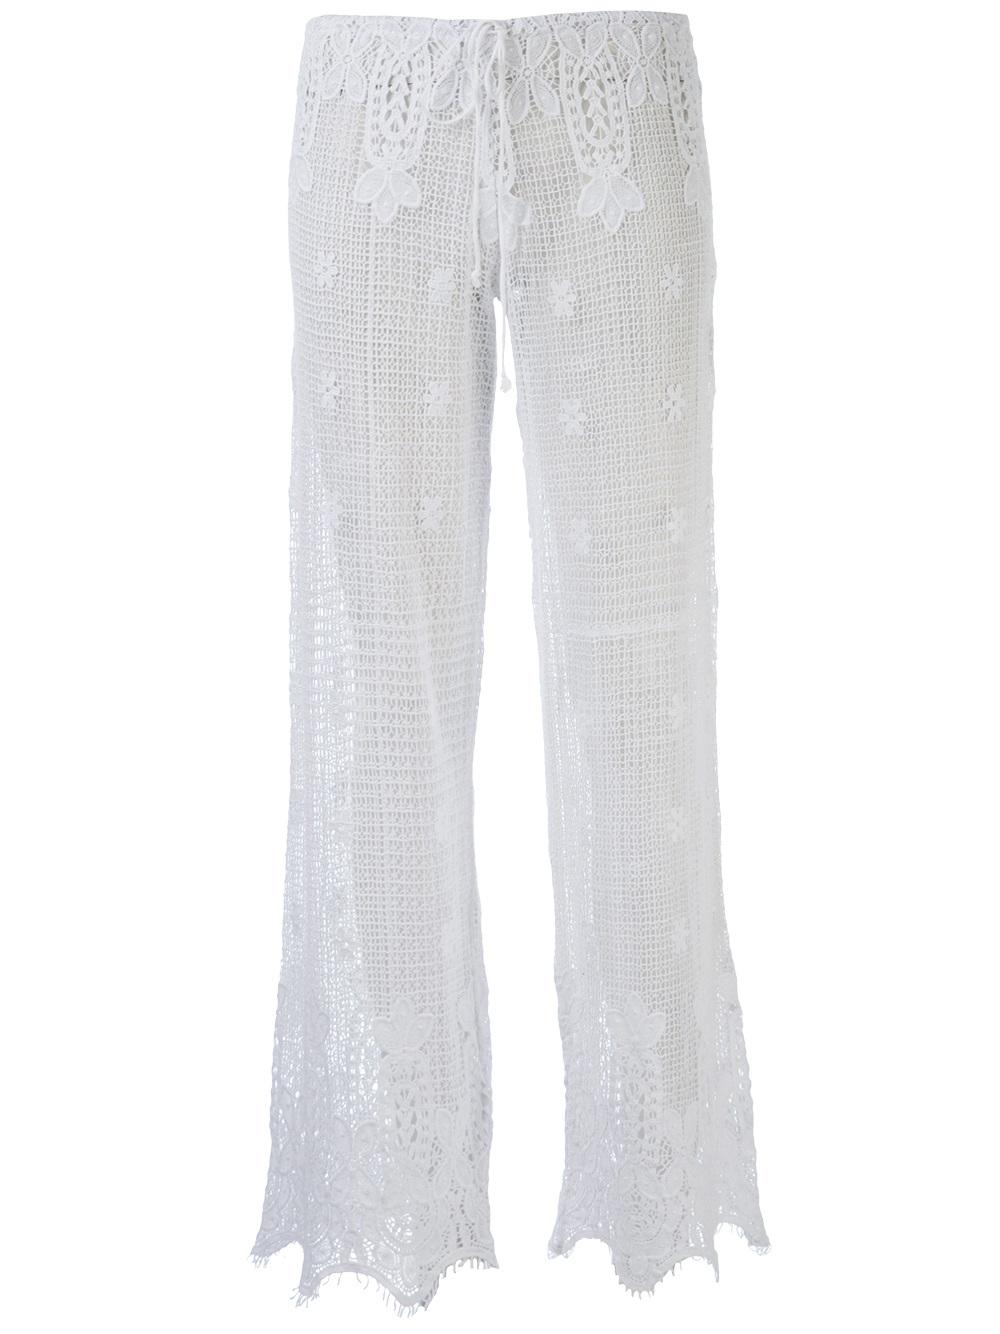 Les Pantalons - 3/4 Pantalons Longs Miguelina 5tETEZ